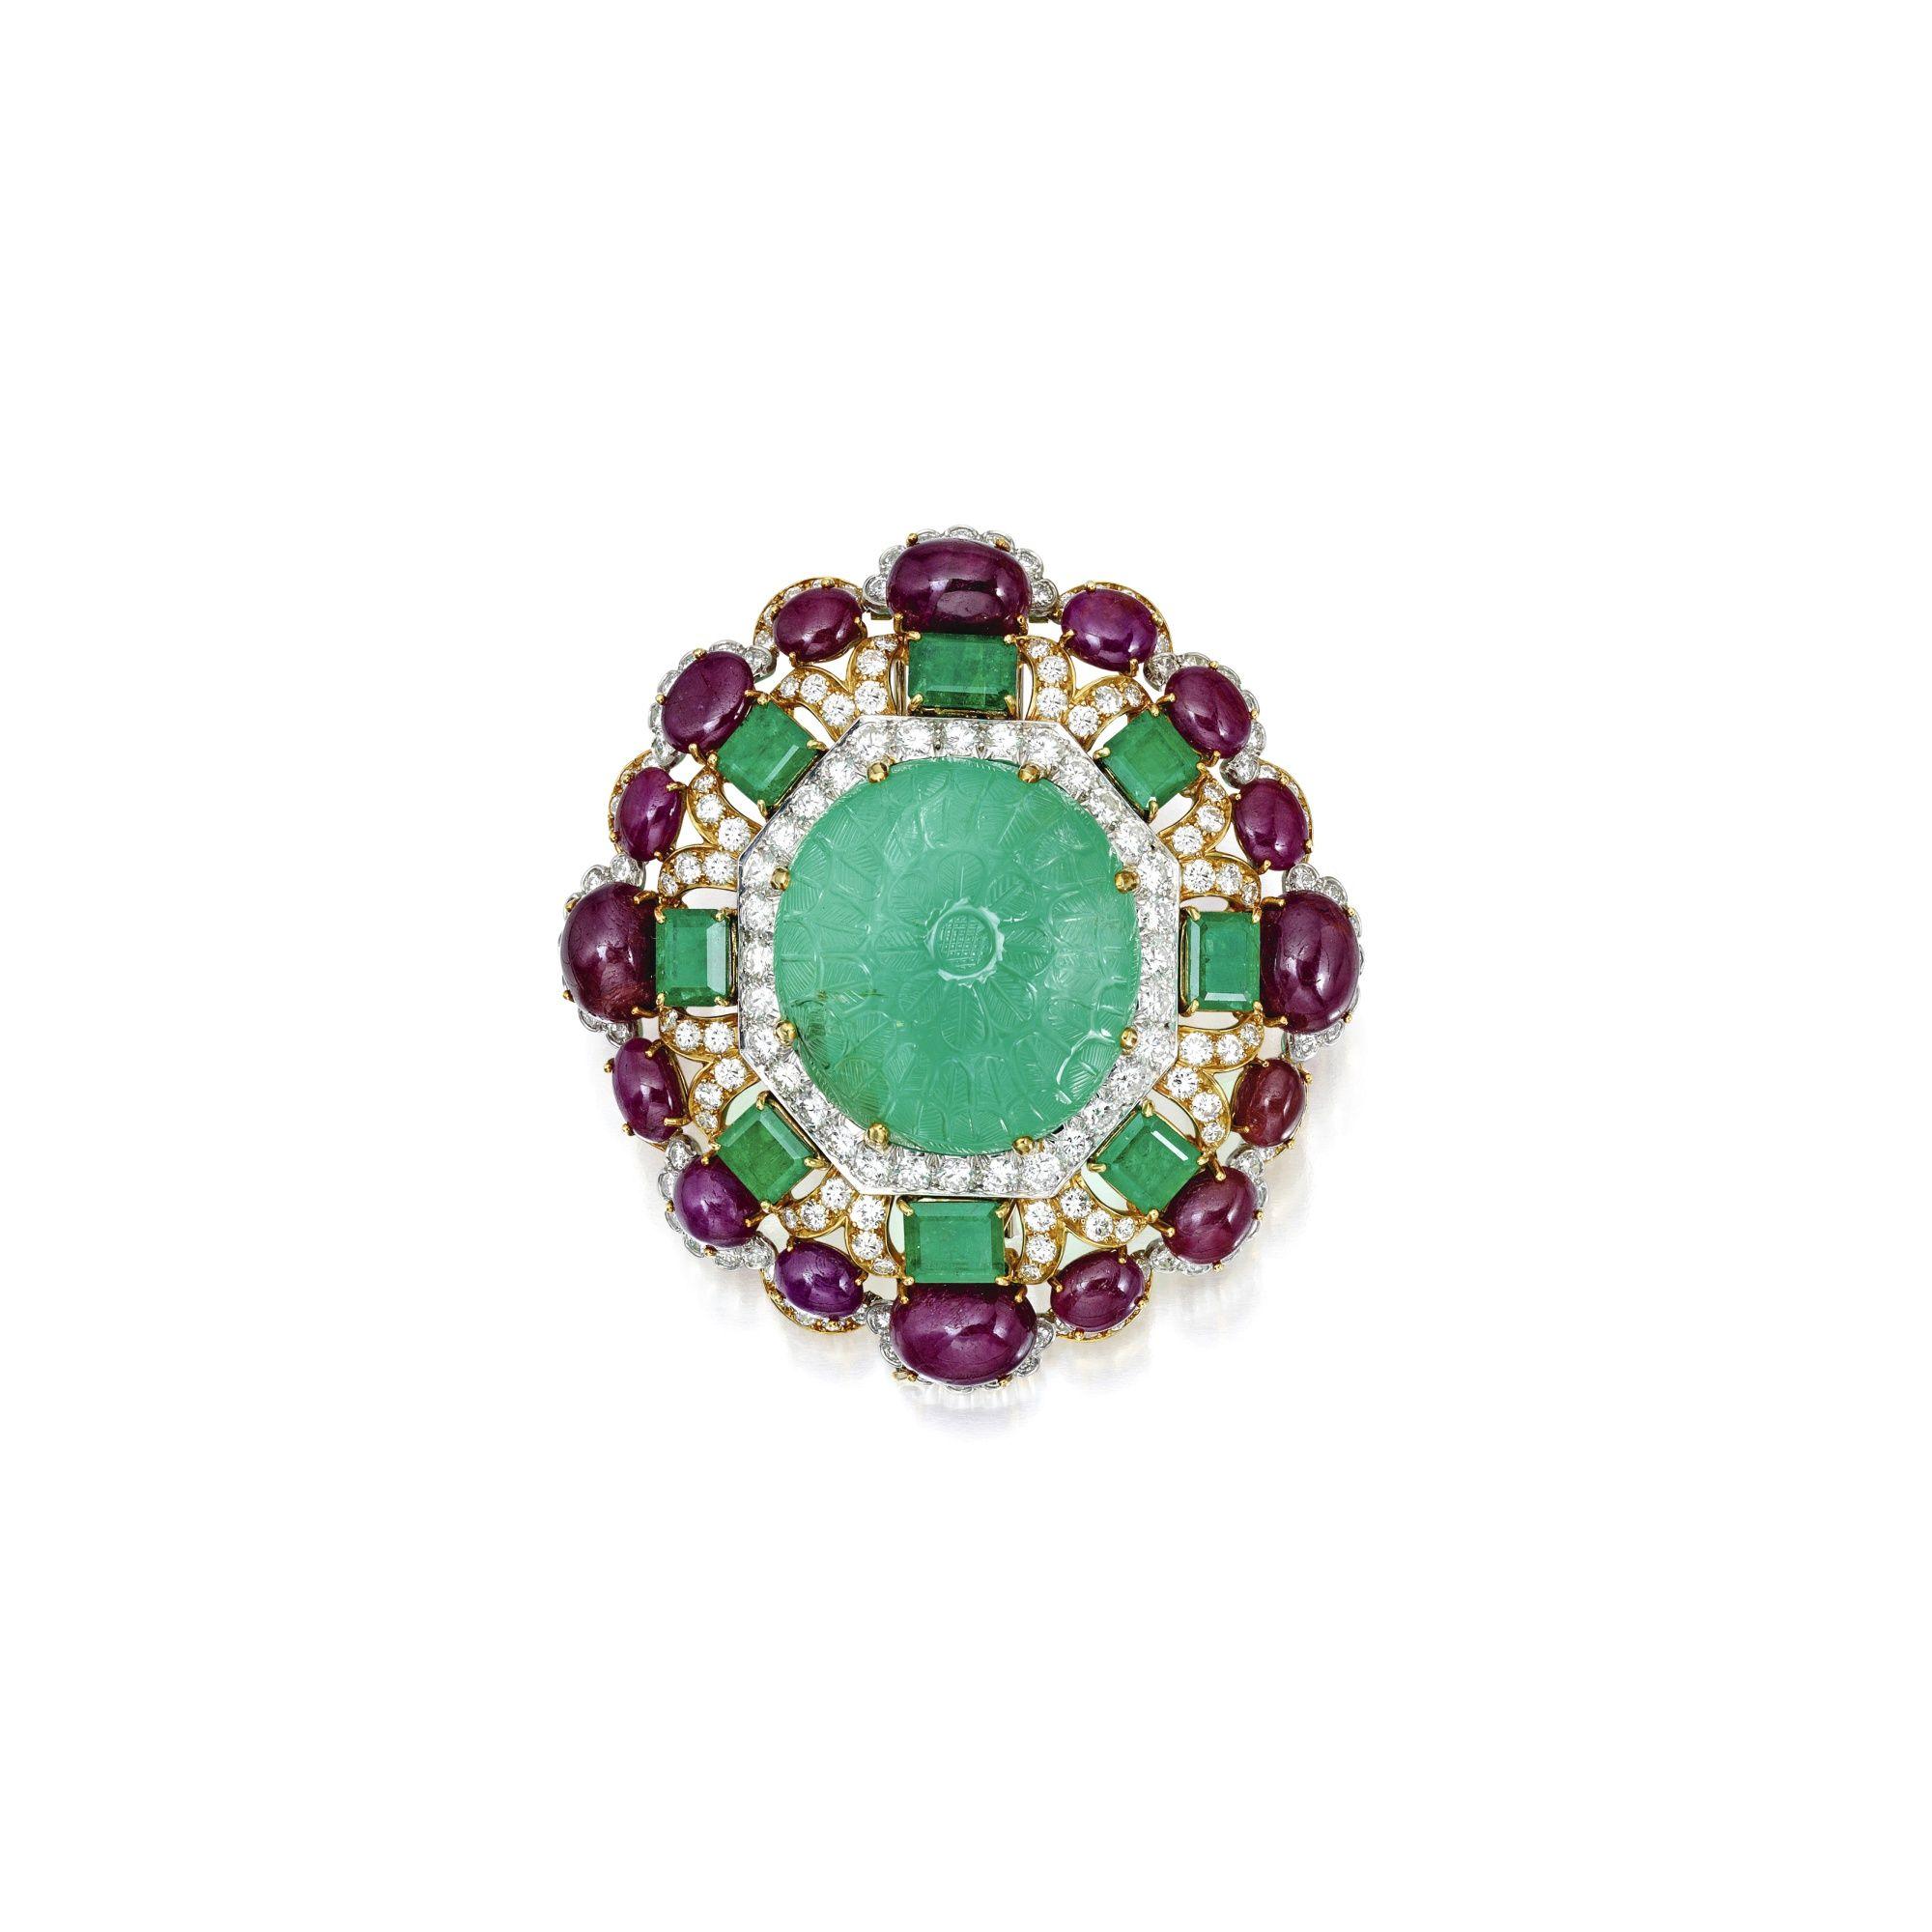 Gemset and diamond pendantbrooch david webb of floral design